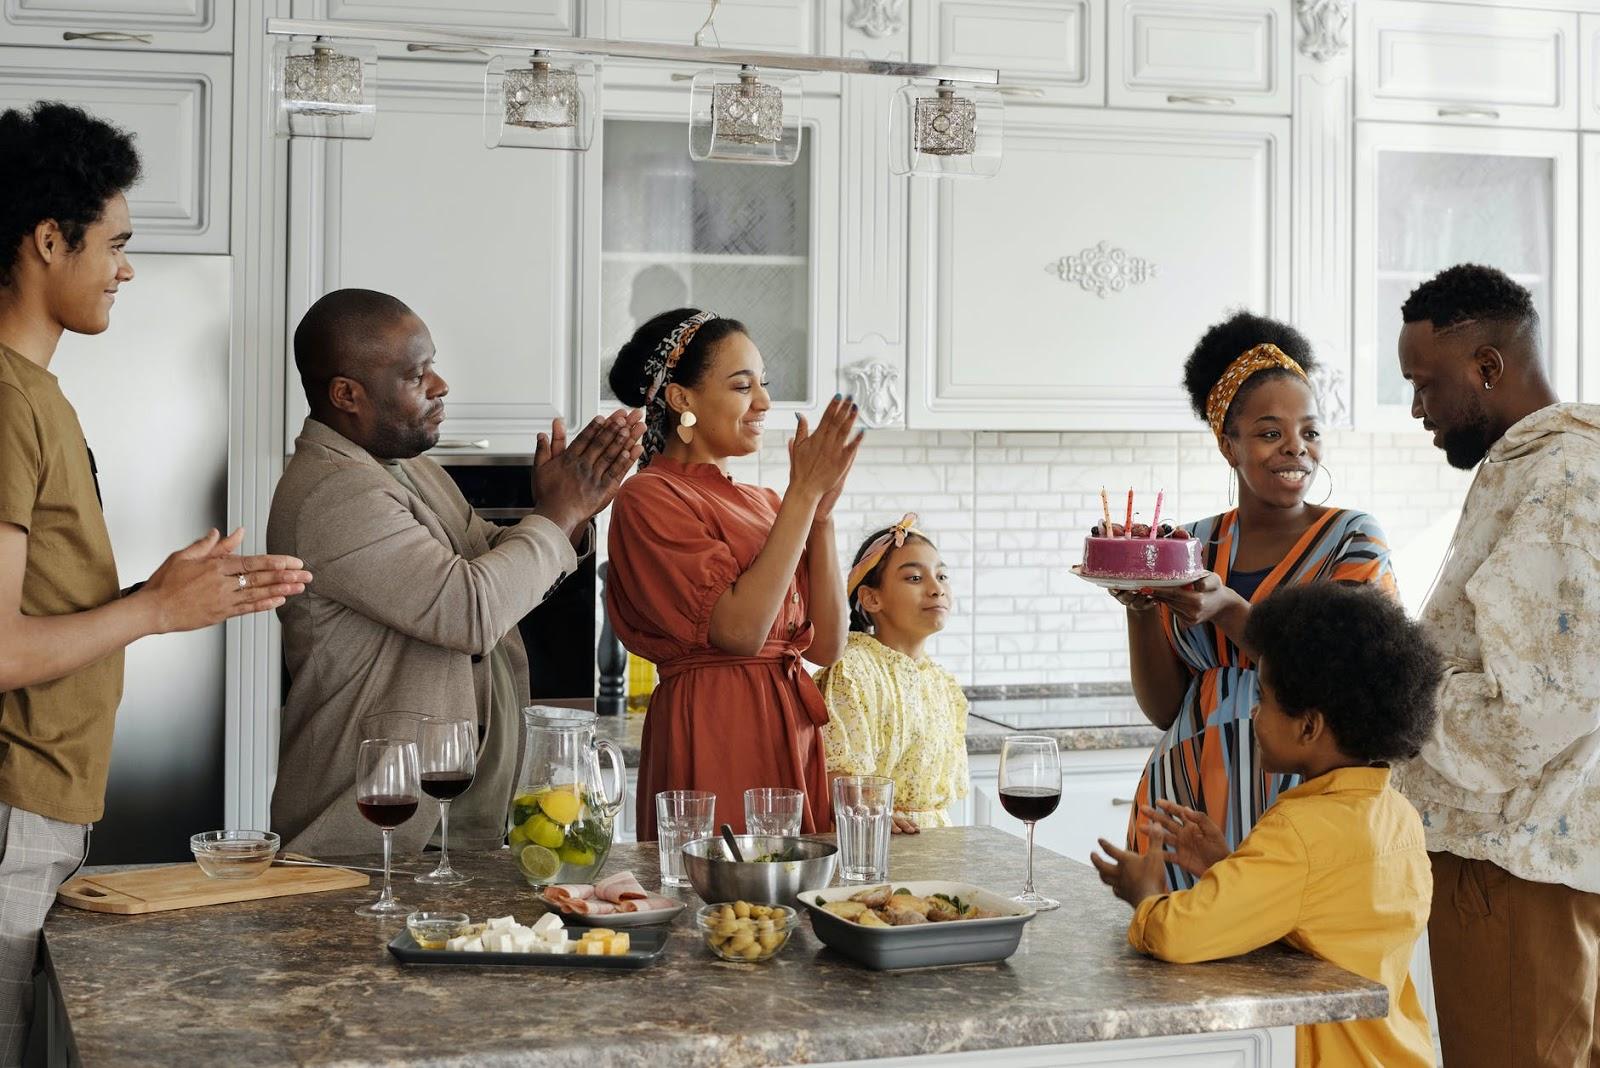 Family gathered around food to celebrate birthday